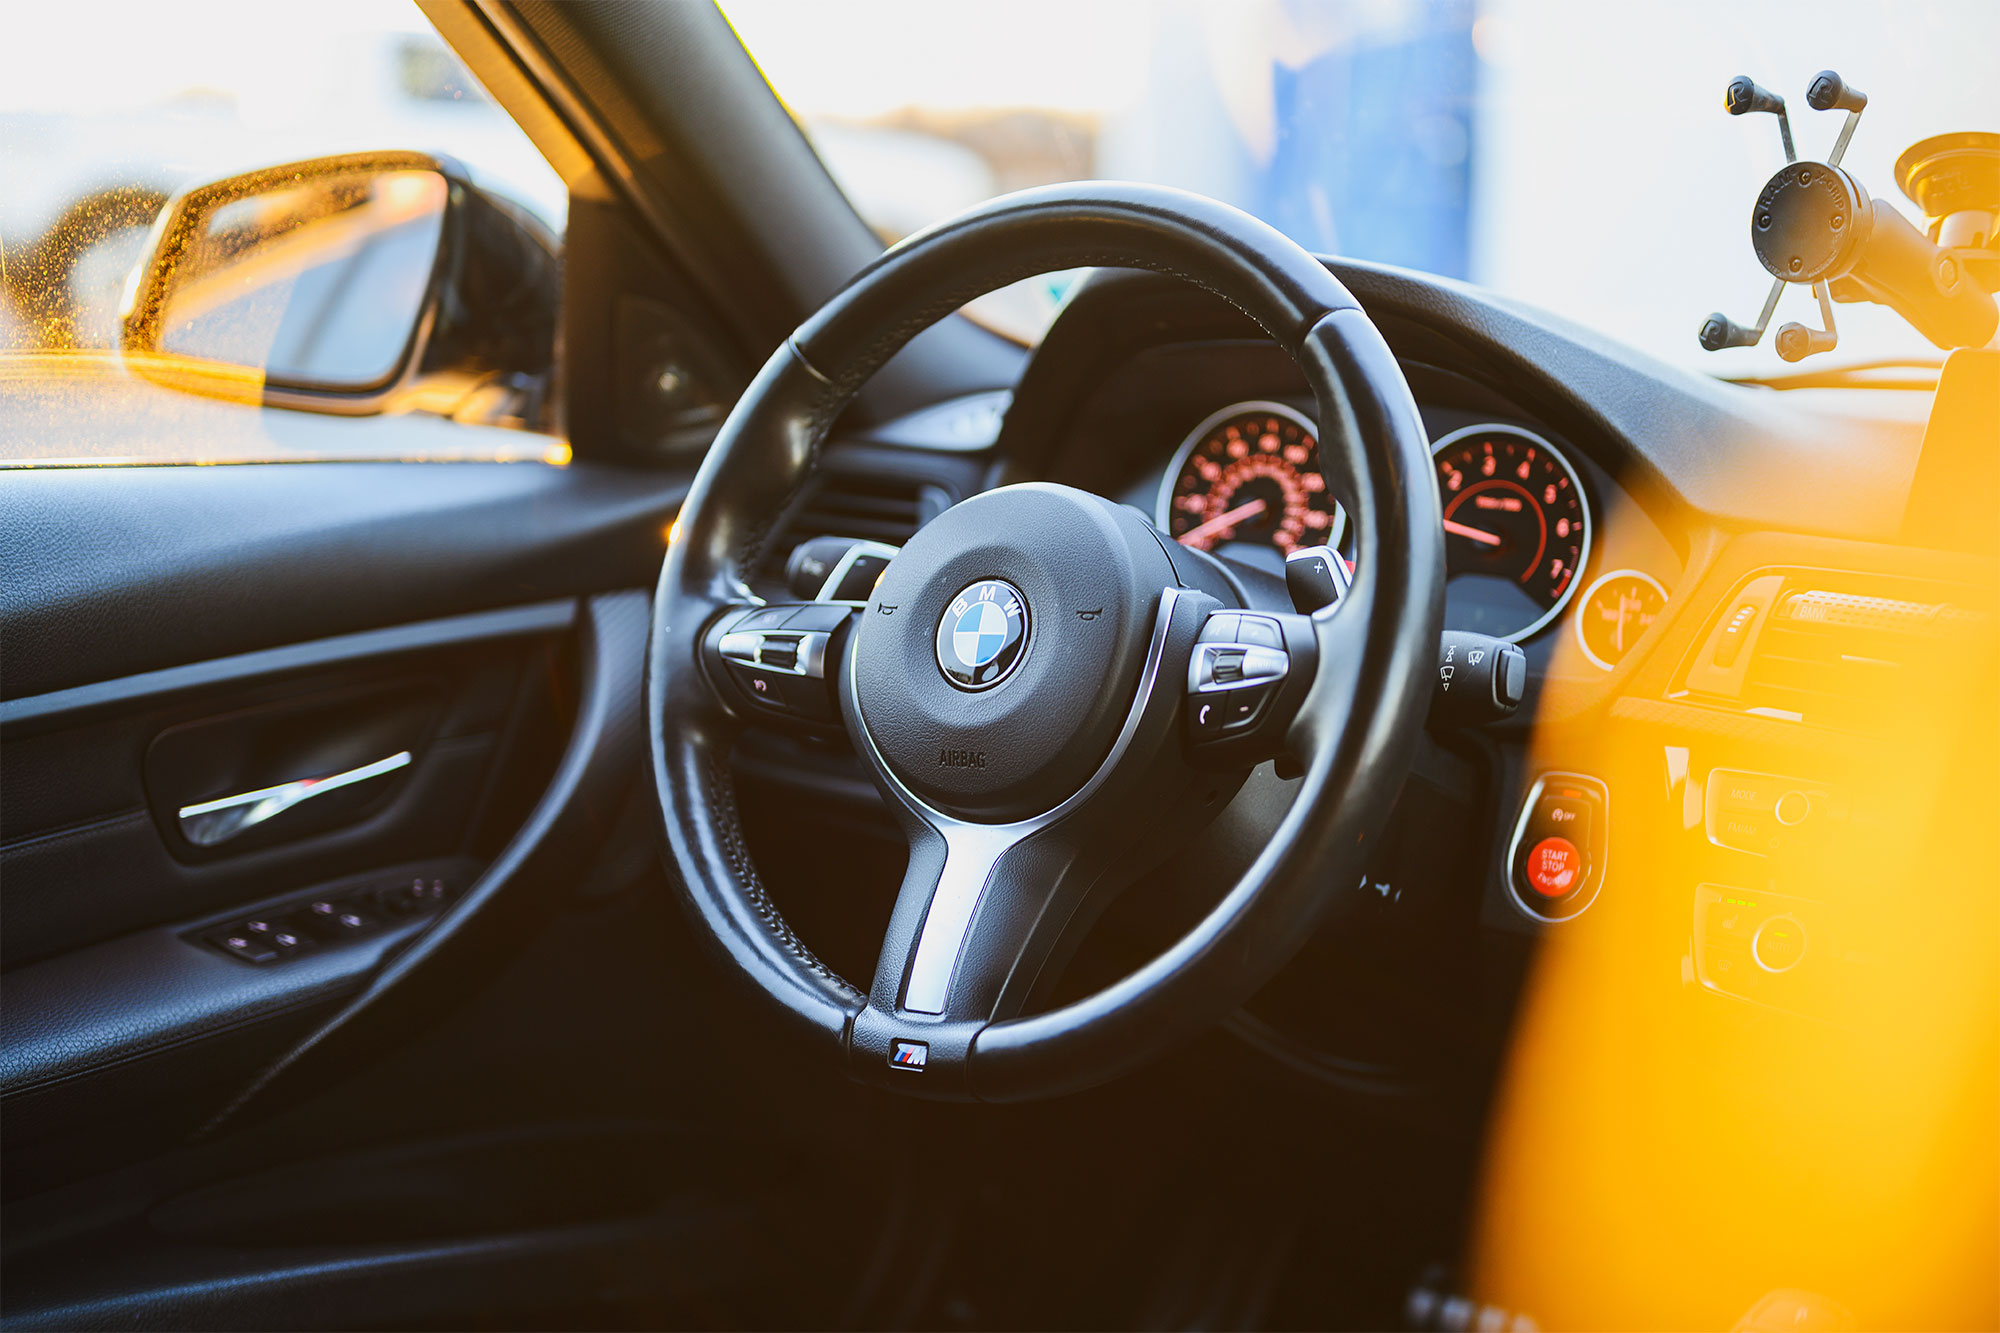 BMW F30 335i steering wheel